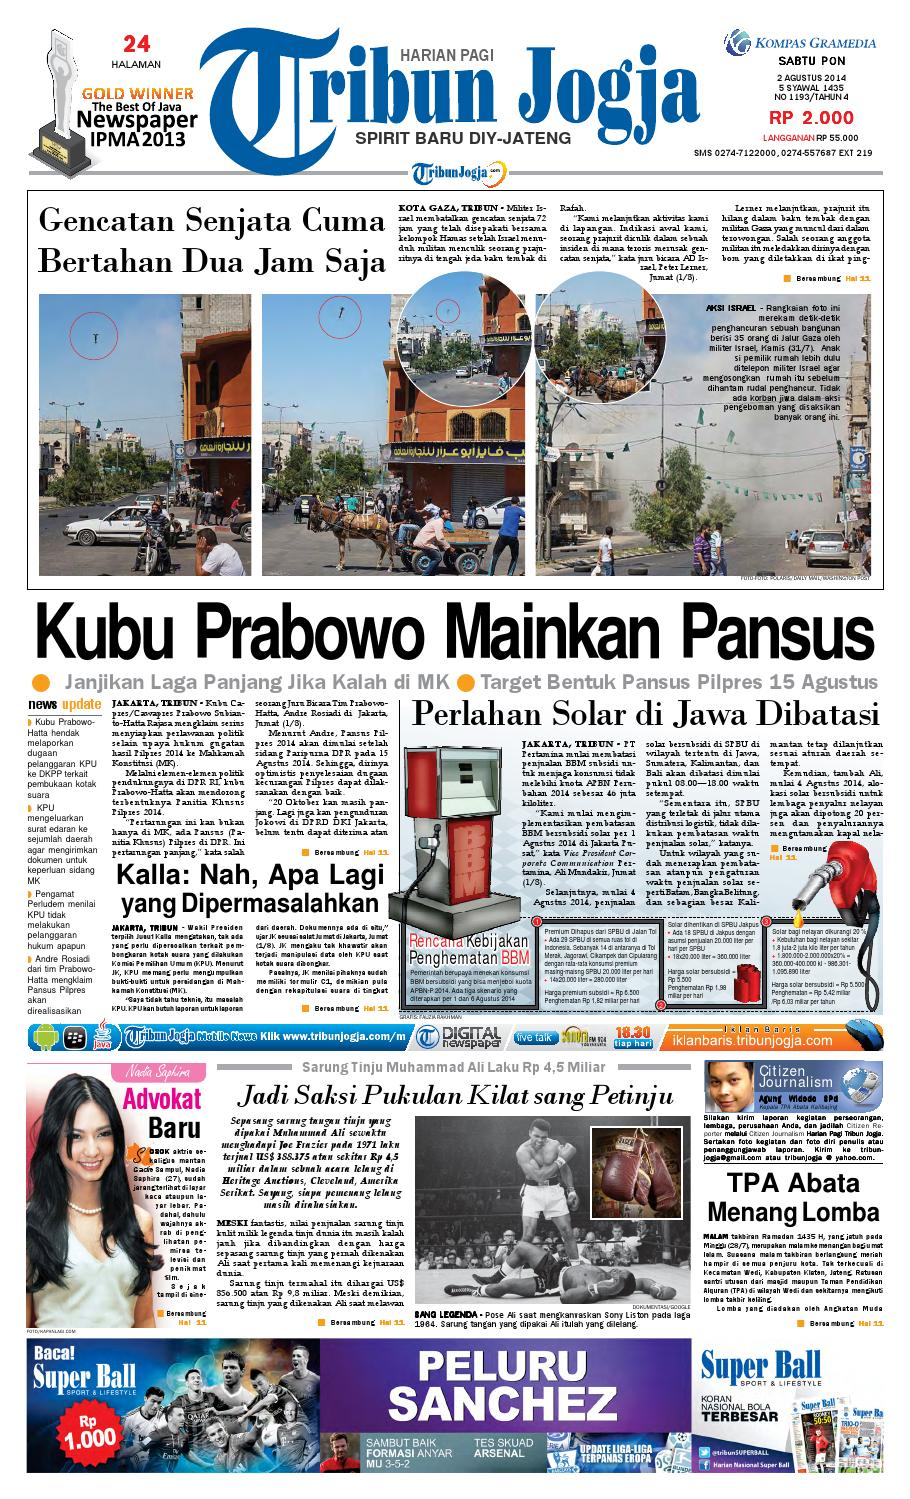 Tribunjogja 02 08 2014 By Tribun Jogja Issuu Ramatranz Travel Lampung Jakarta Palembang Dan Paket Kilat